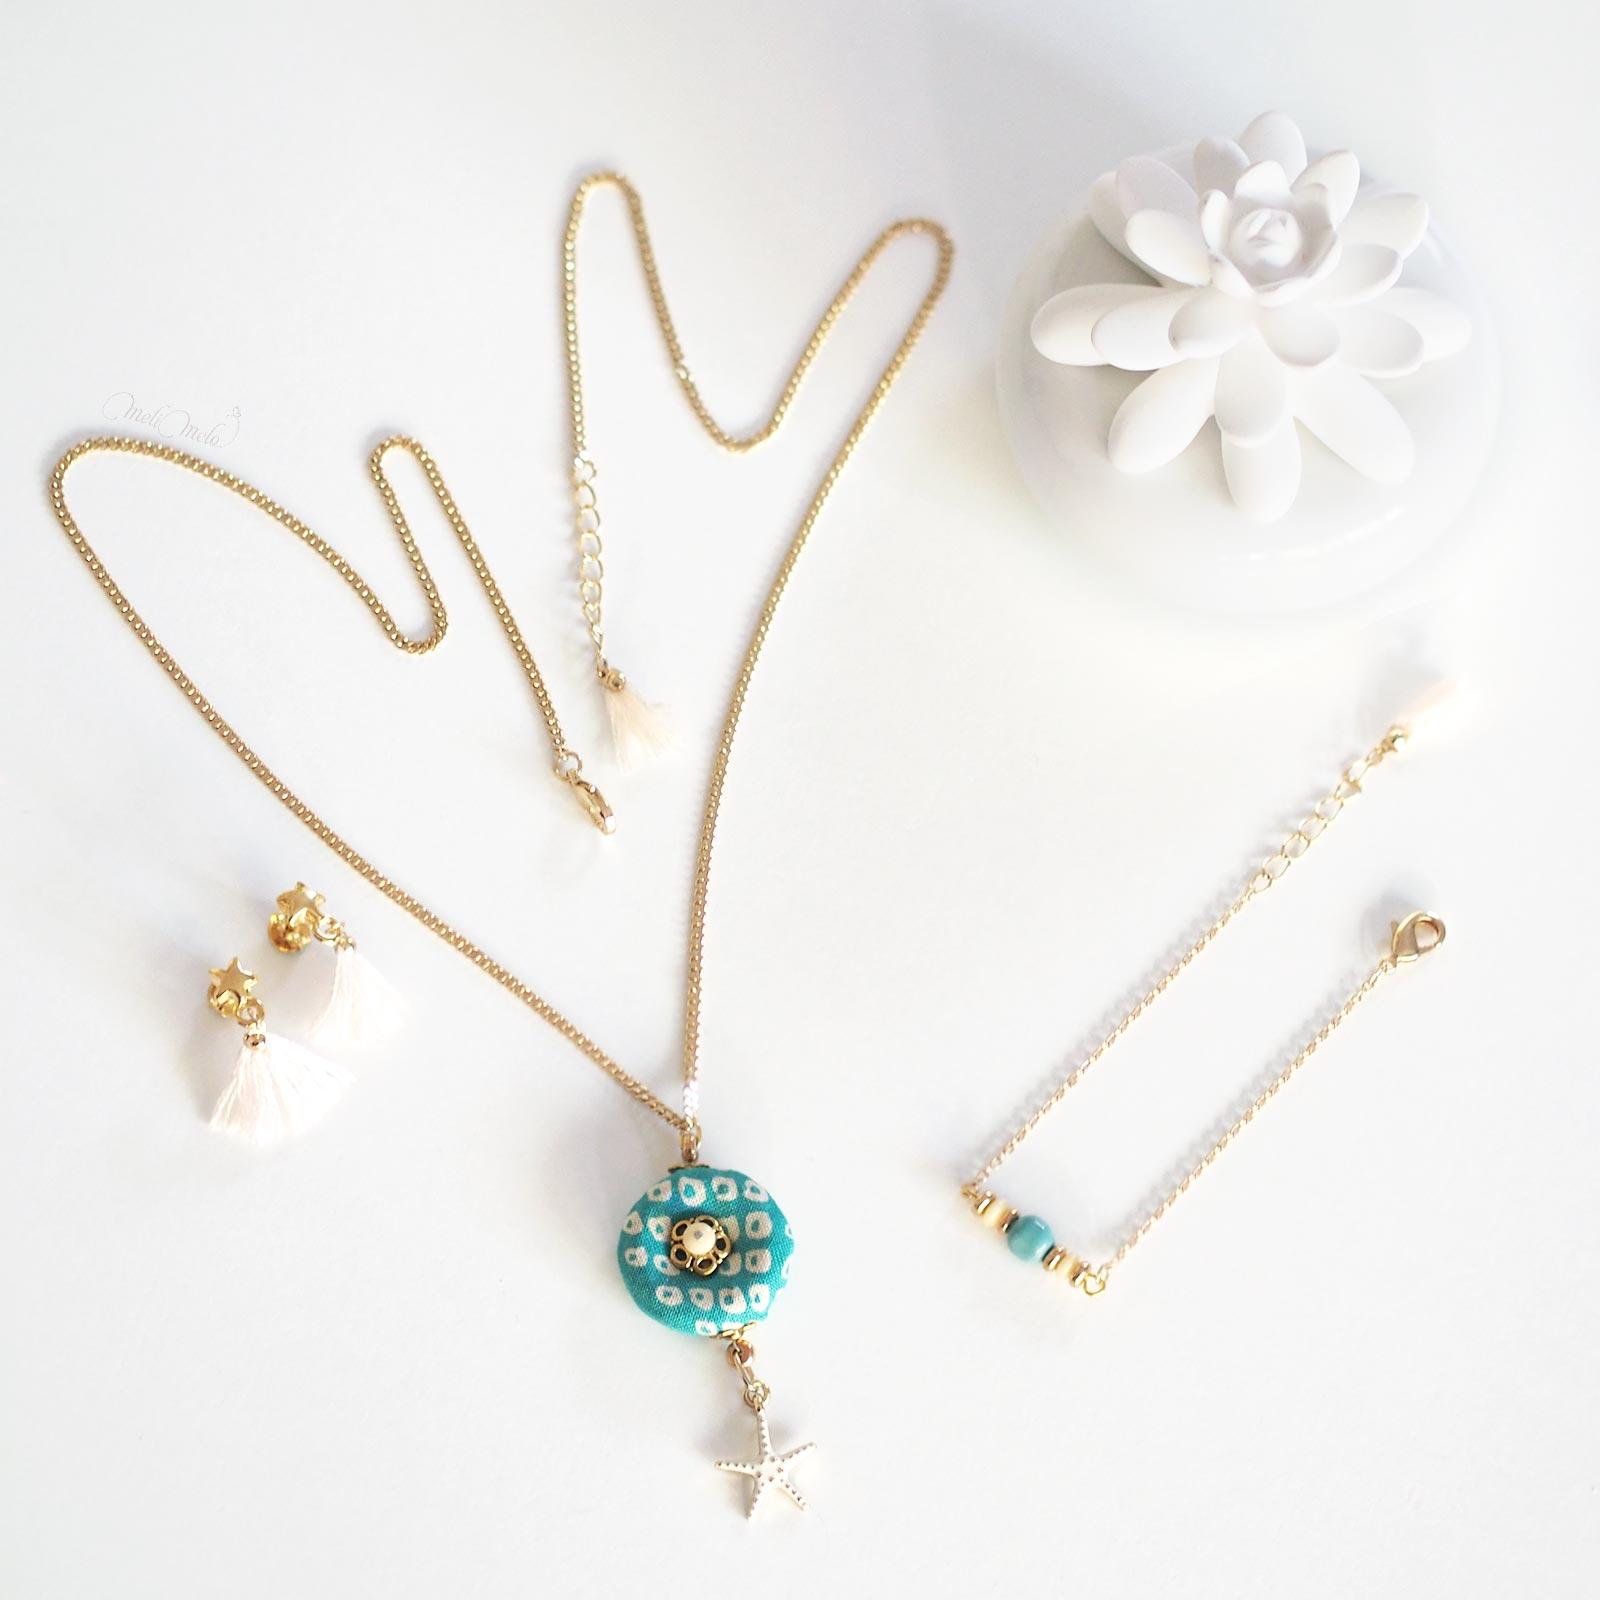 bijoux étoile de mer pompons or Shakuyaku argent laboutiquedemelimelo